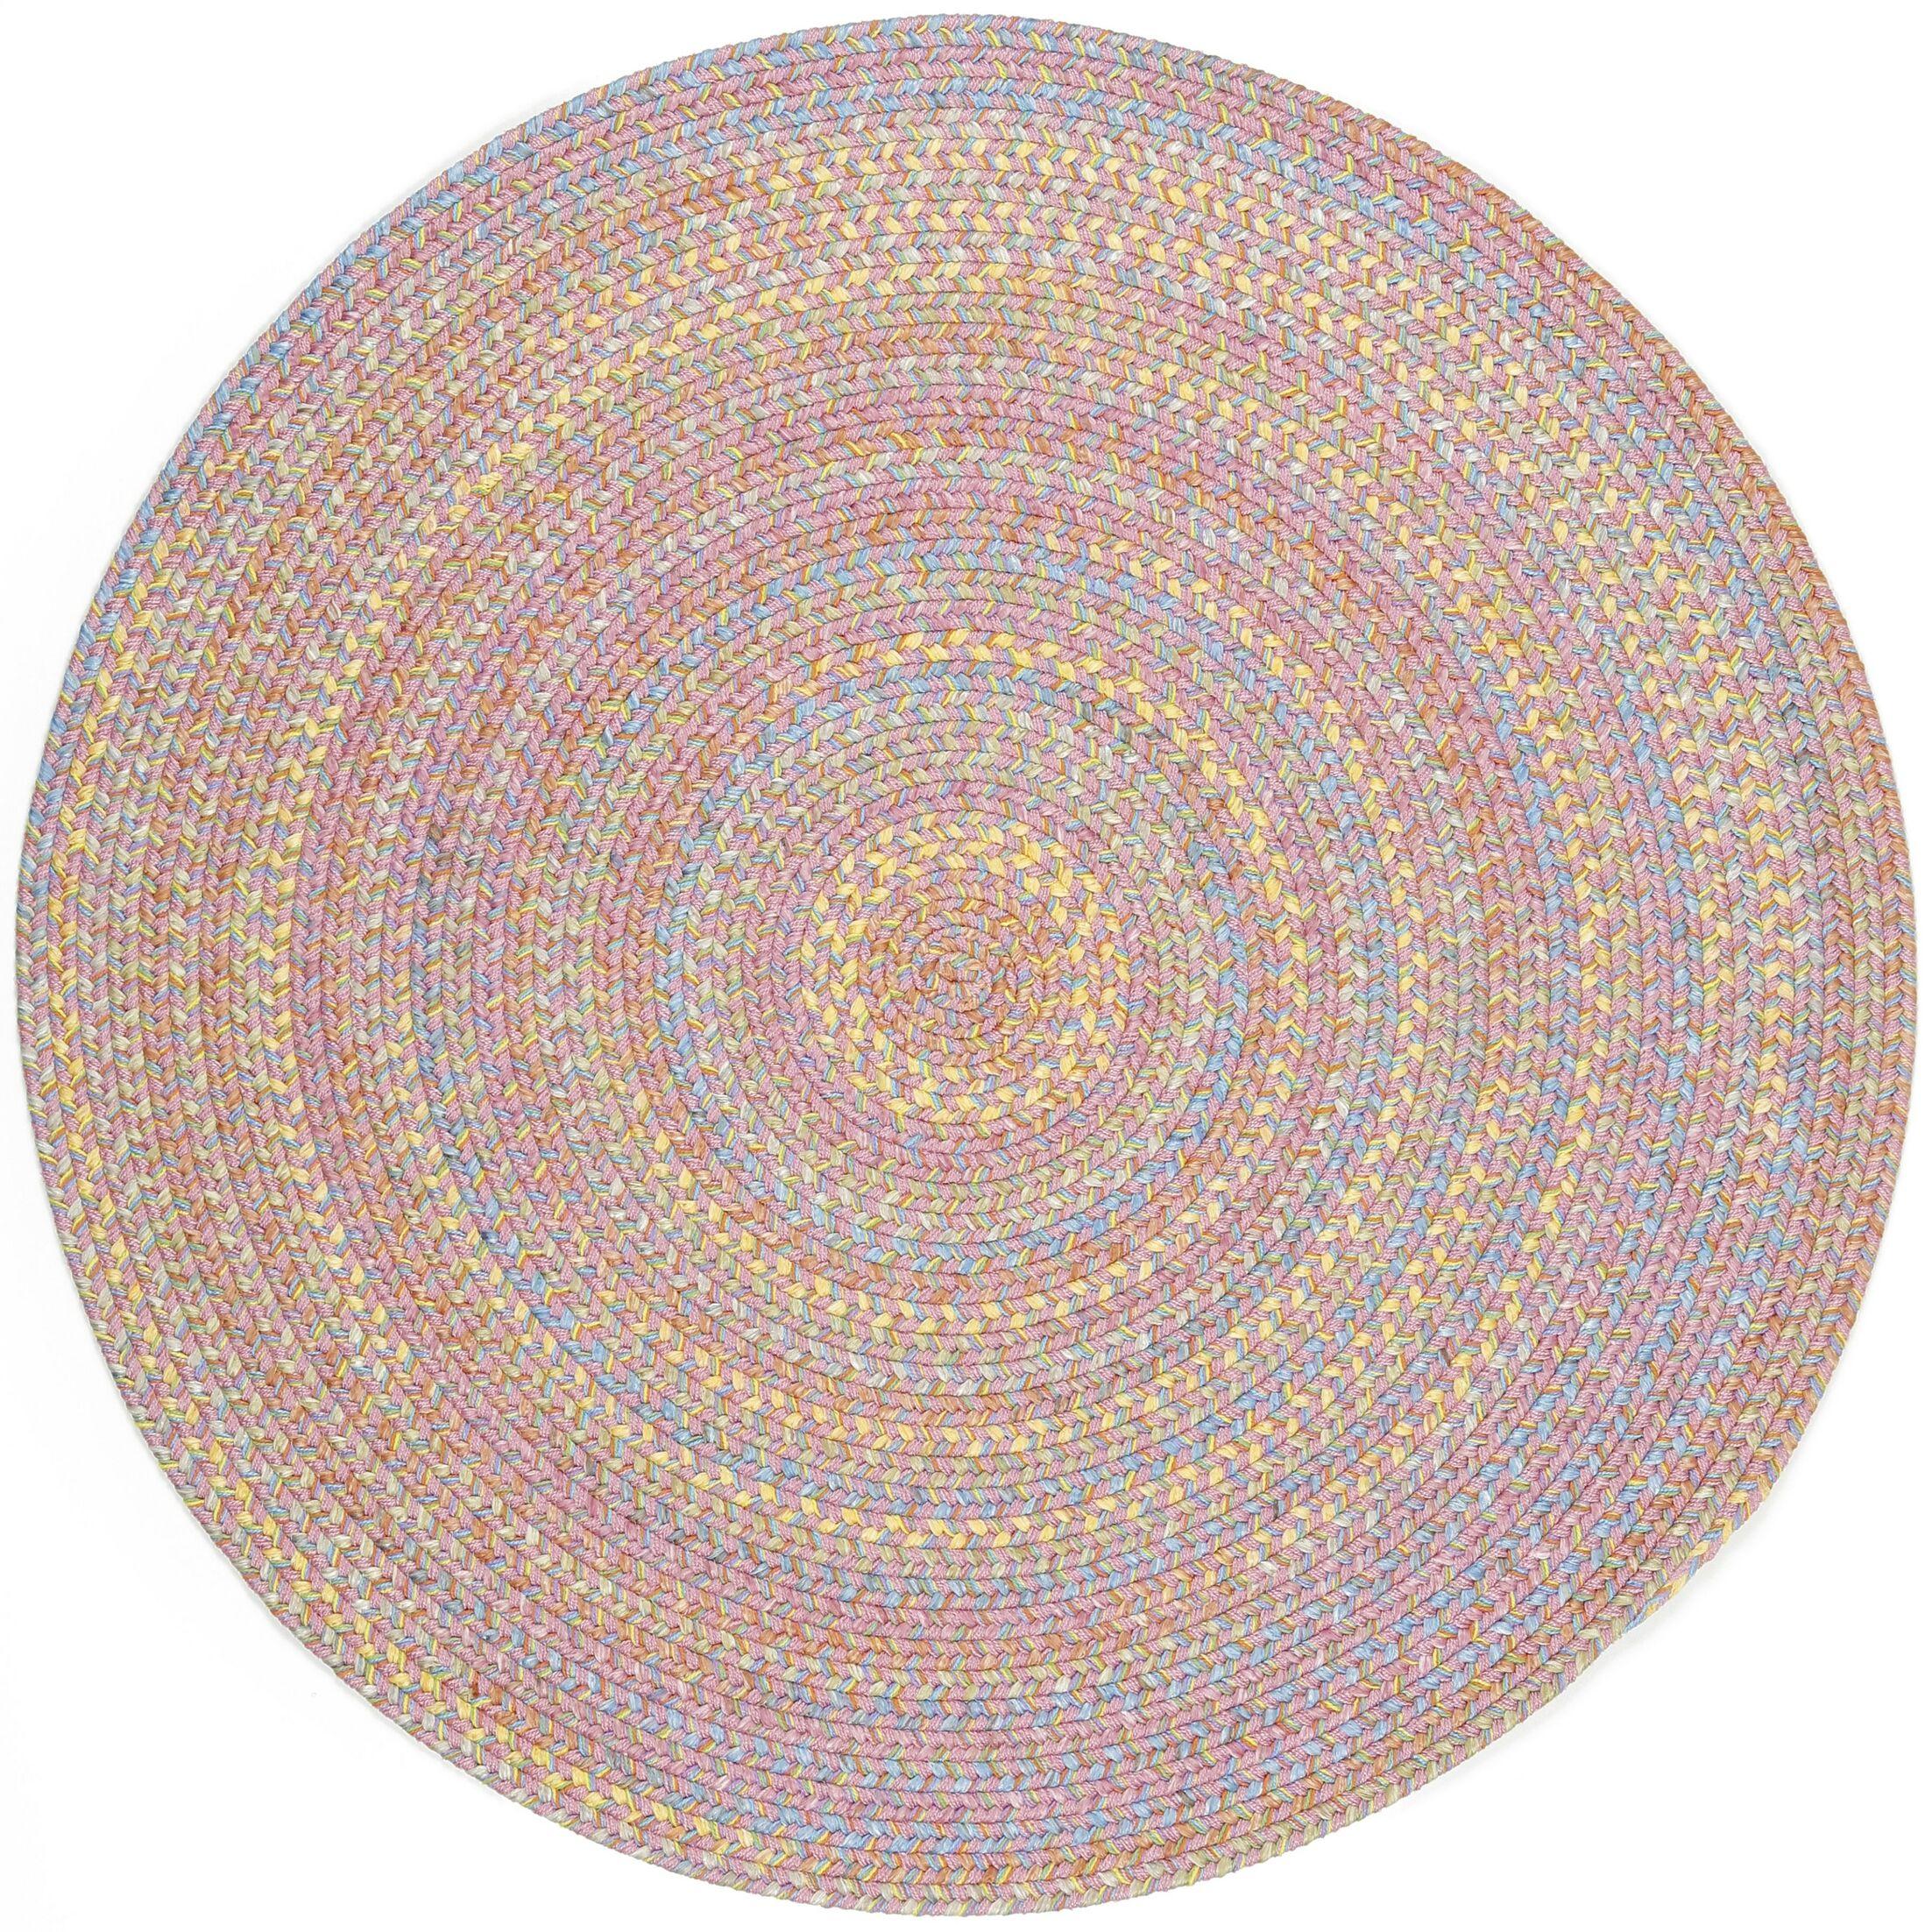 Saidpur Pink Indoor/Outdoor Area Rug Rug Size: Round 10'